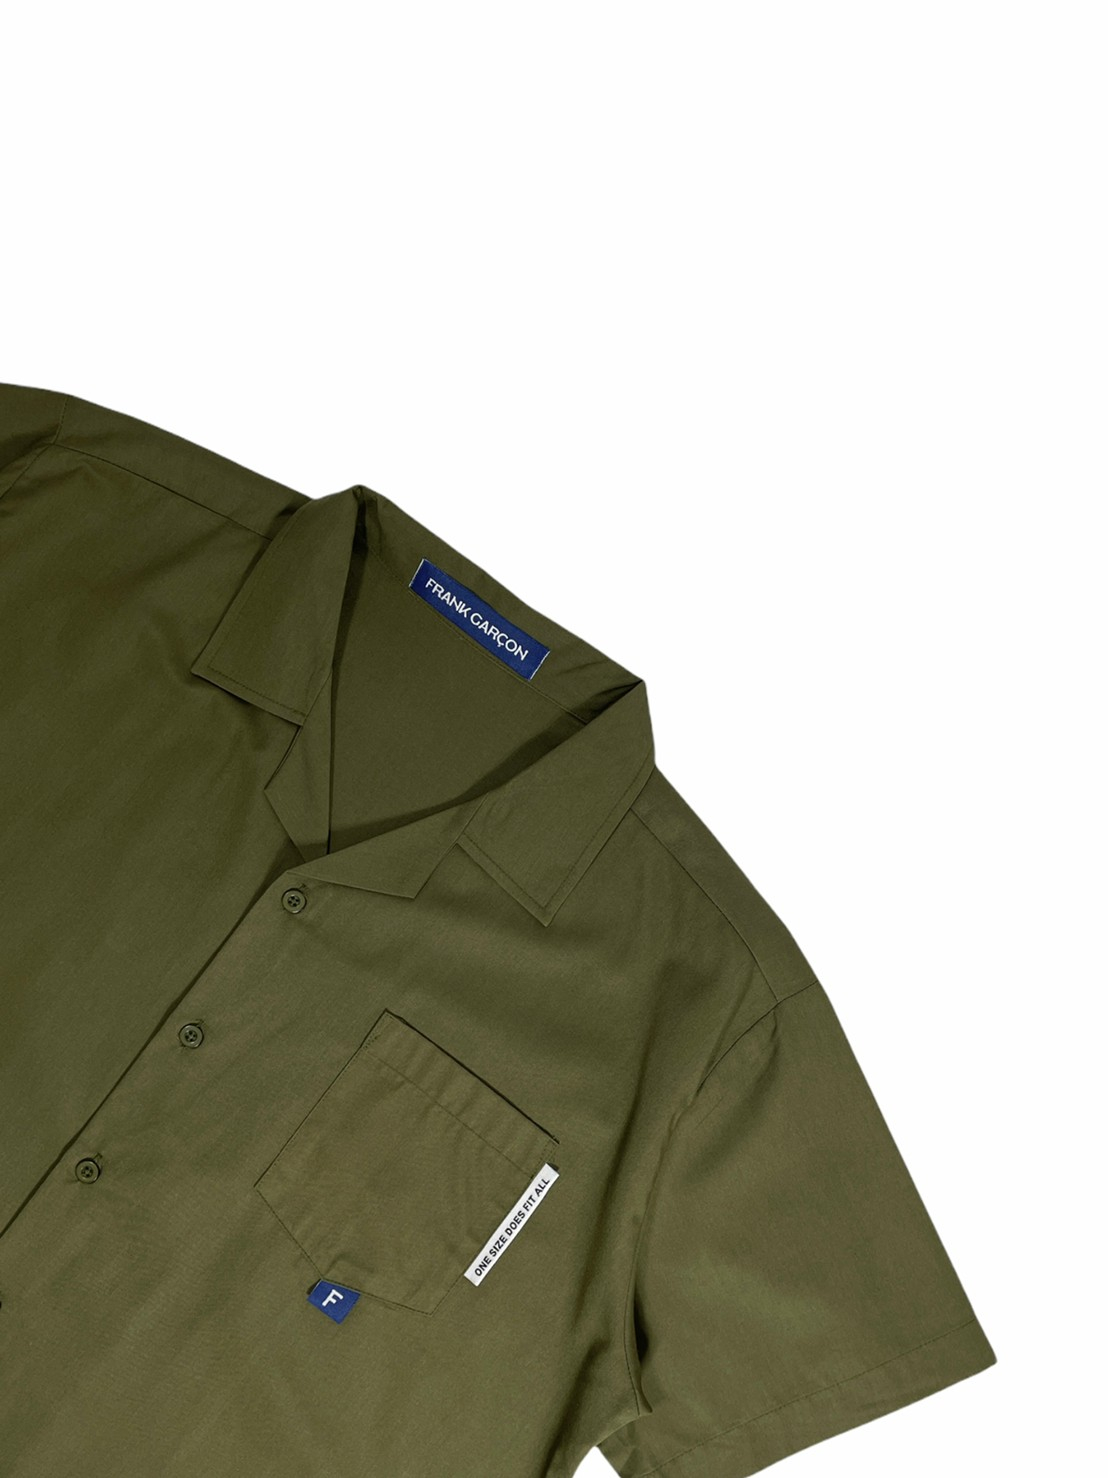 FRANK ! Camp Collar Shirt (Army Green)